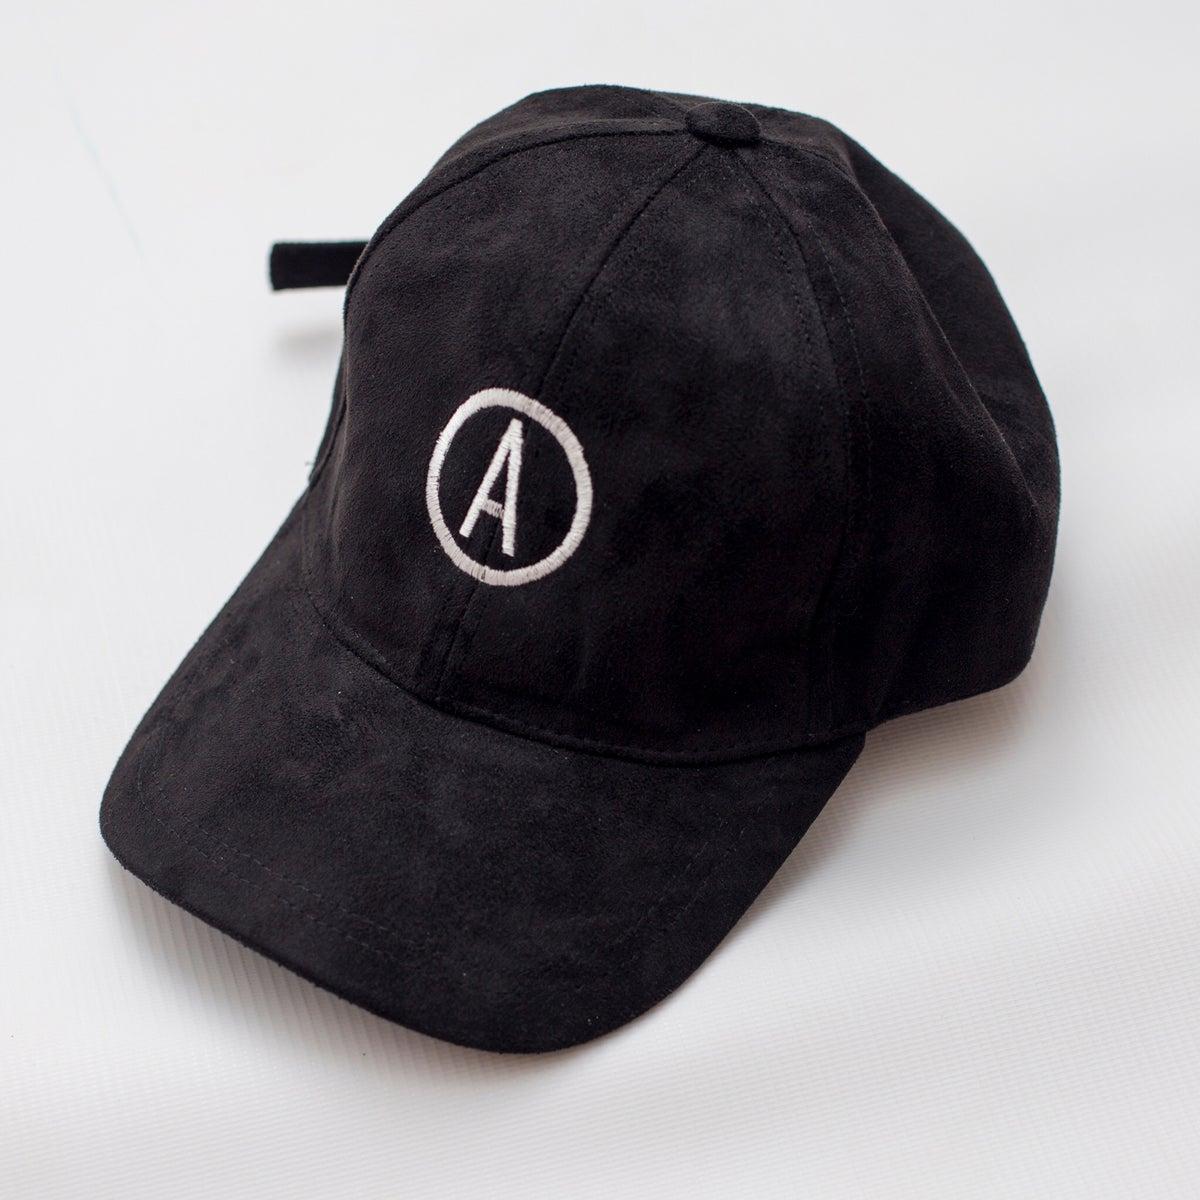 Image of 'REBORN' Suede Baseball Cap - Black